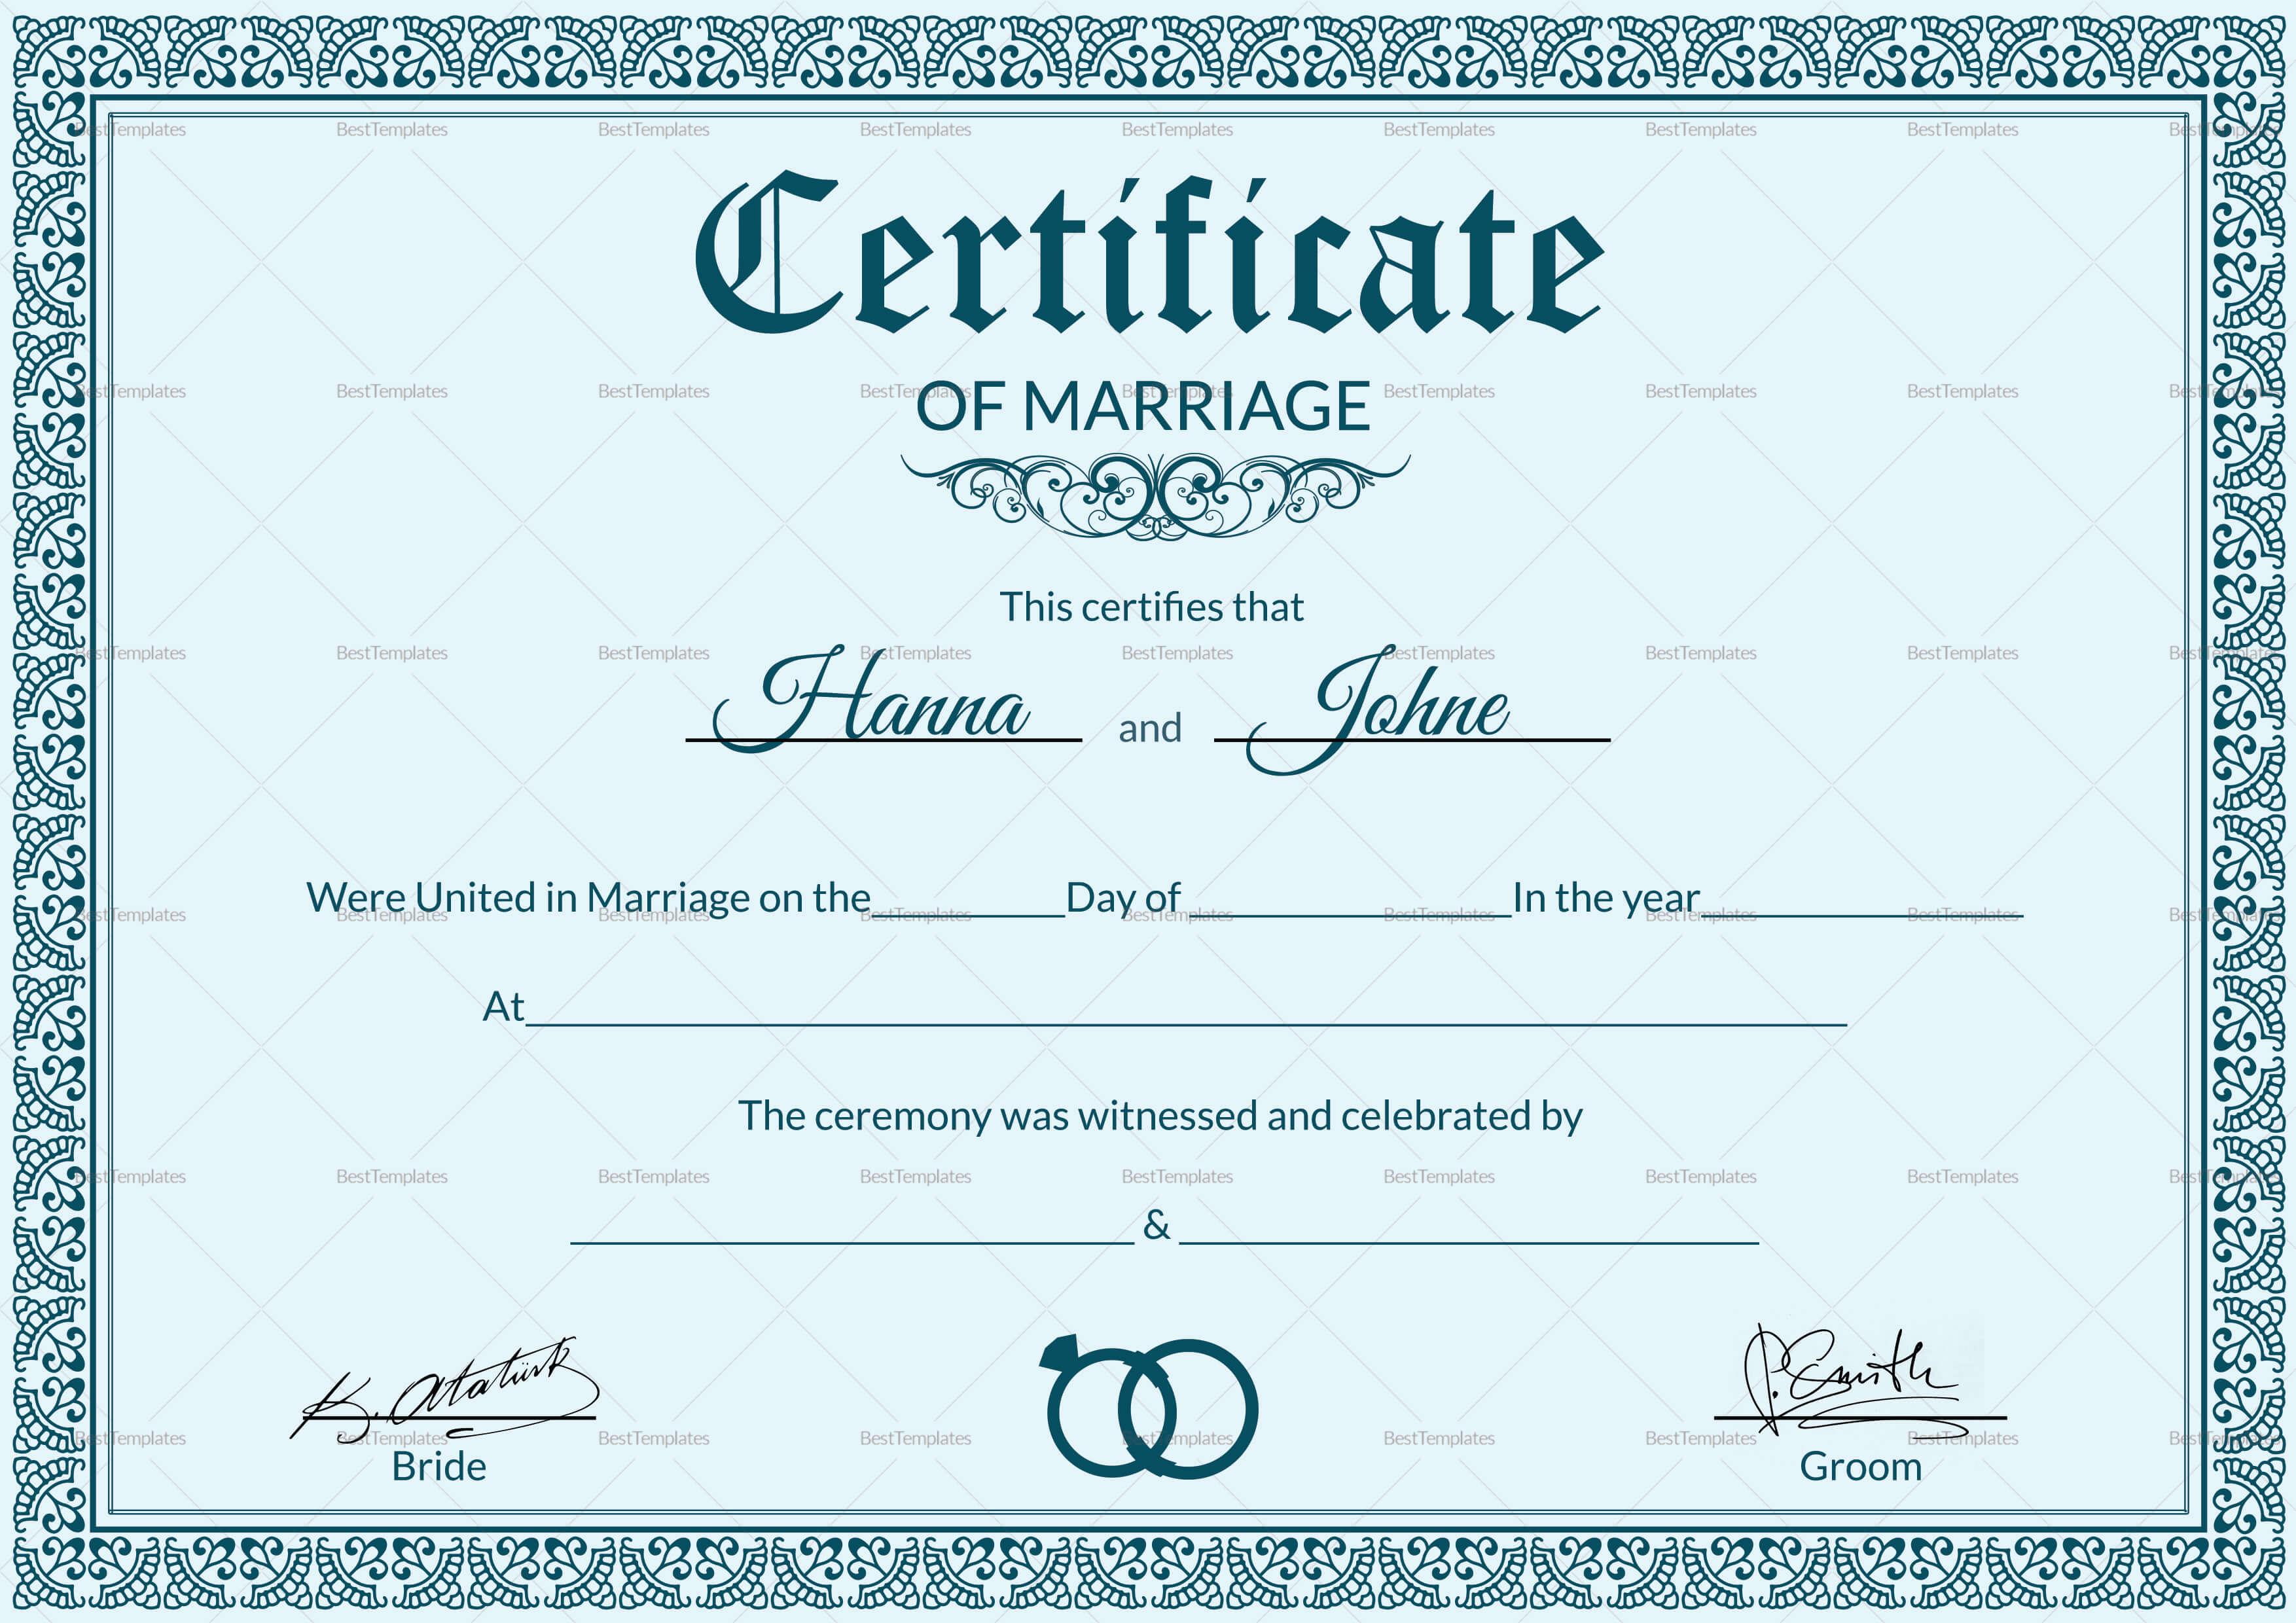 Formal Marriage Certificate Template Regarding Certificate Of Marriage Template